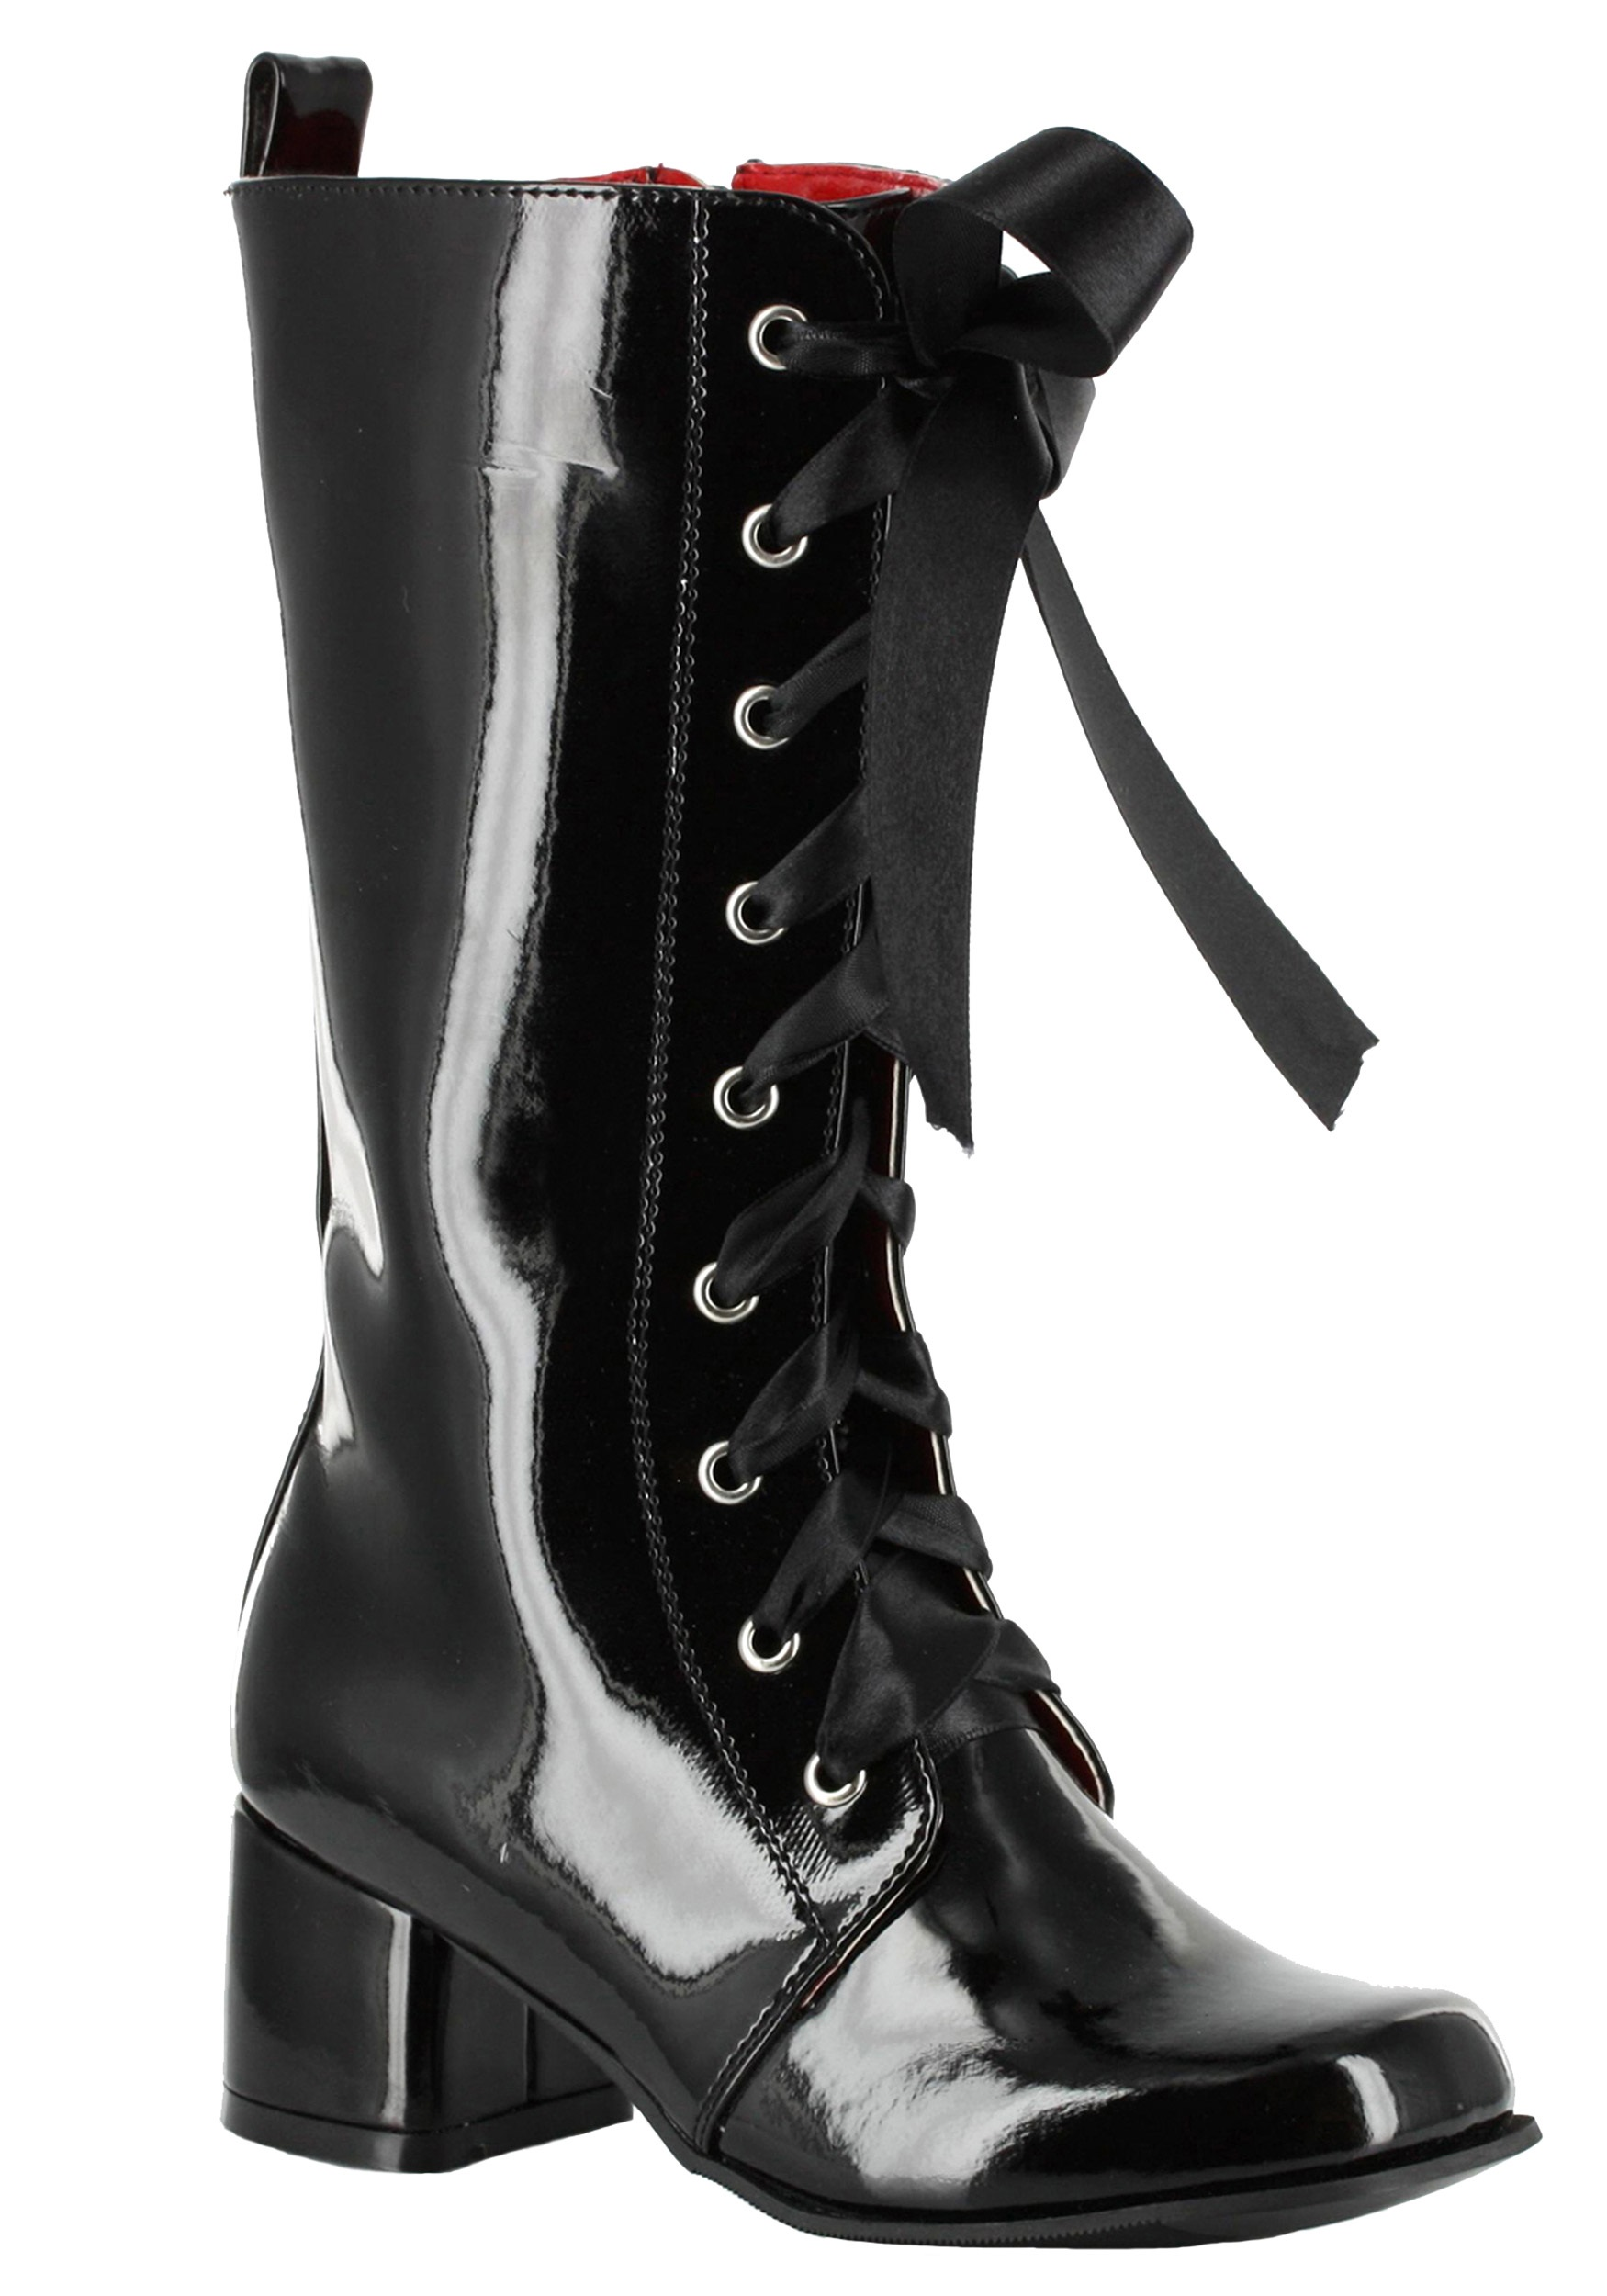 Girls Black Lace Up Gogo Boots